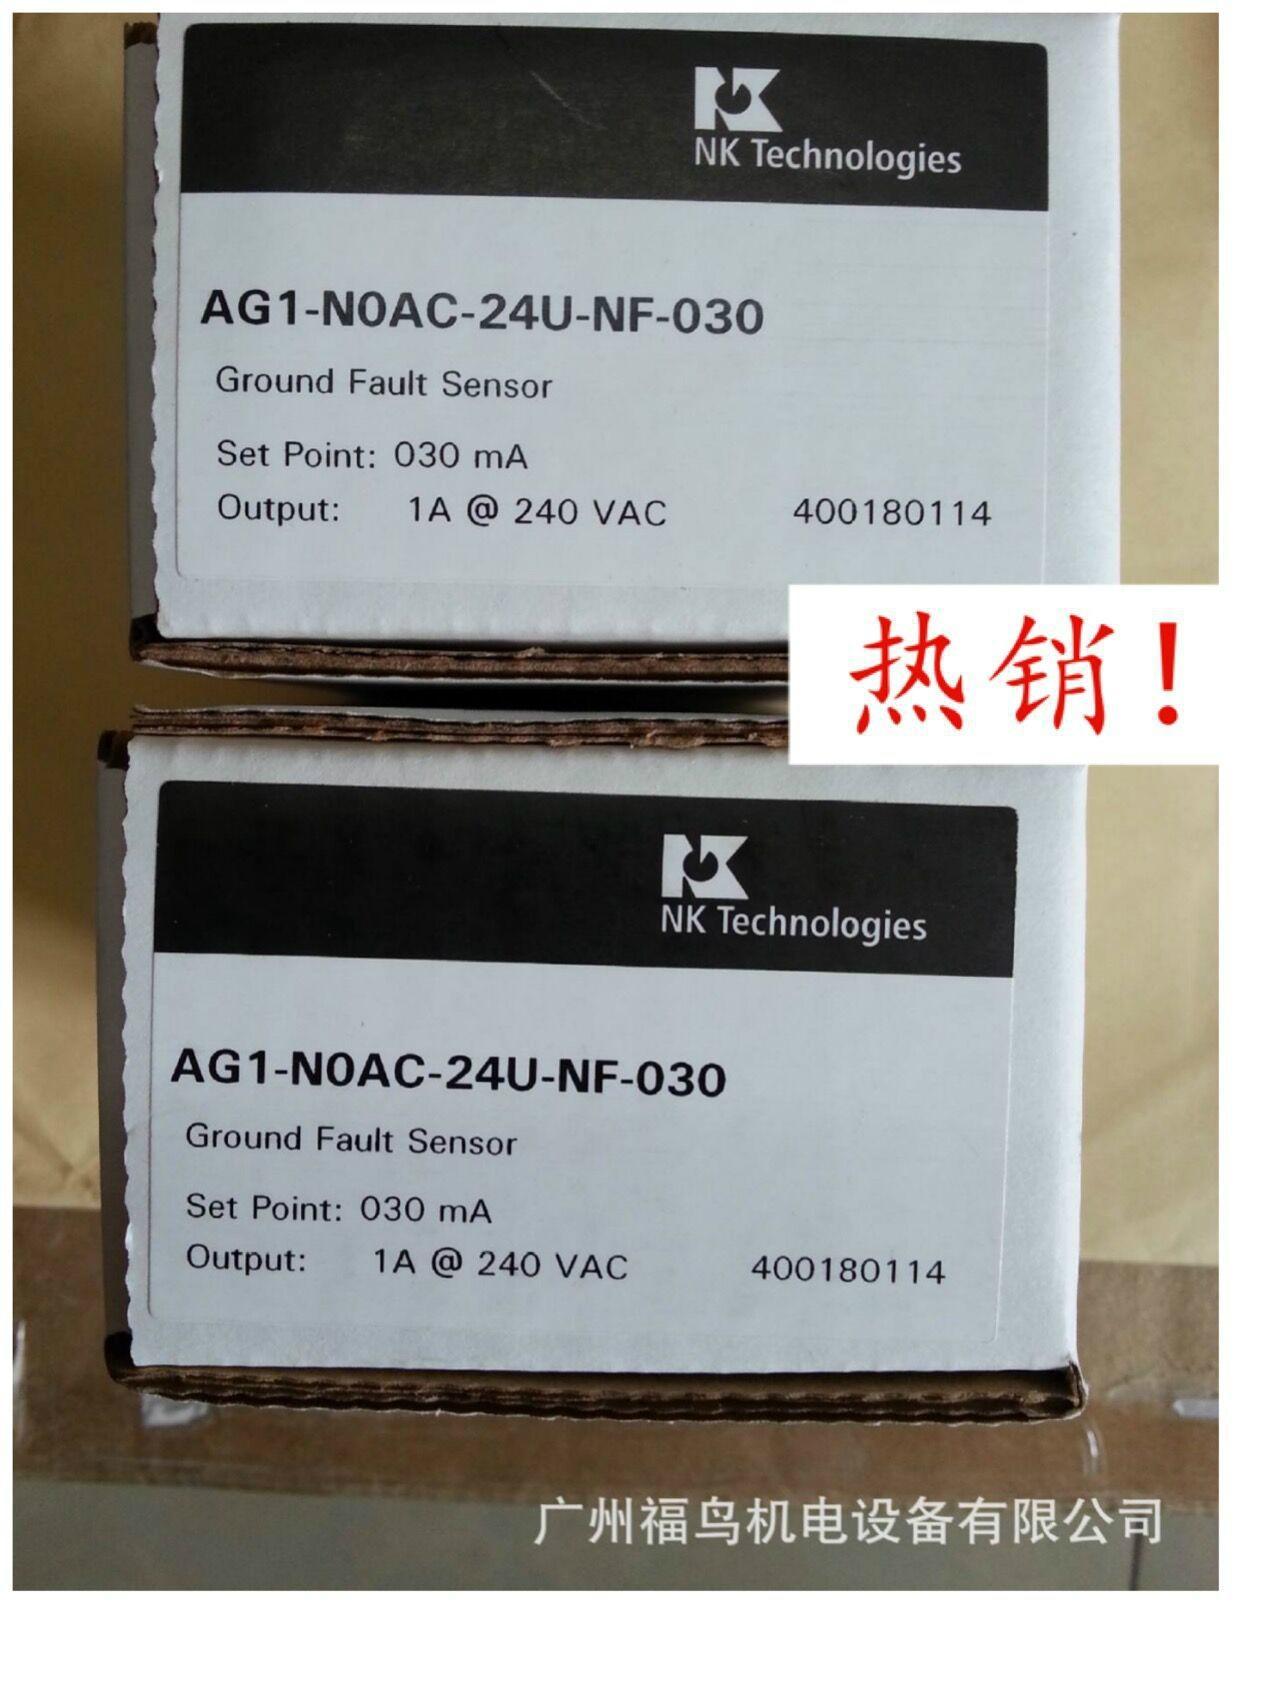 NK TECHNOLOGIES电流传感器, 型号: AG1-NOAC-24U-NF-030